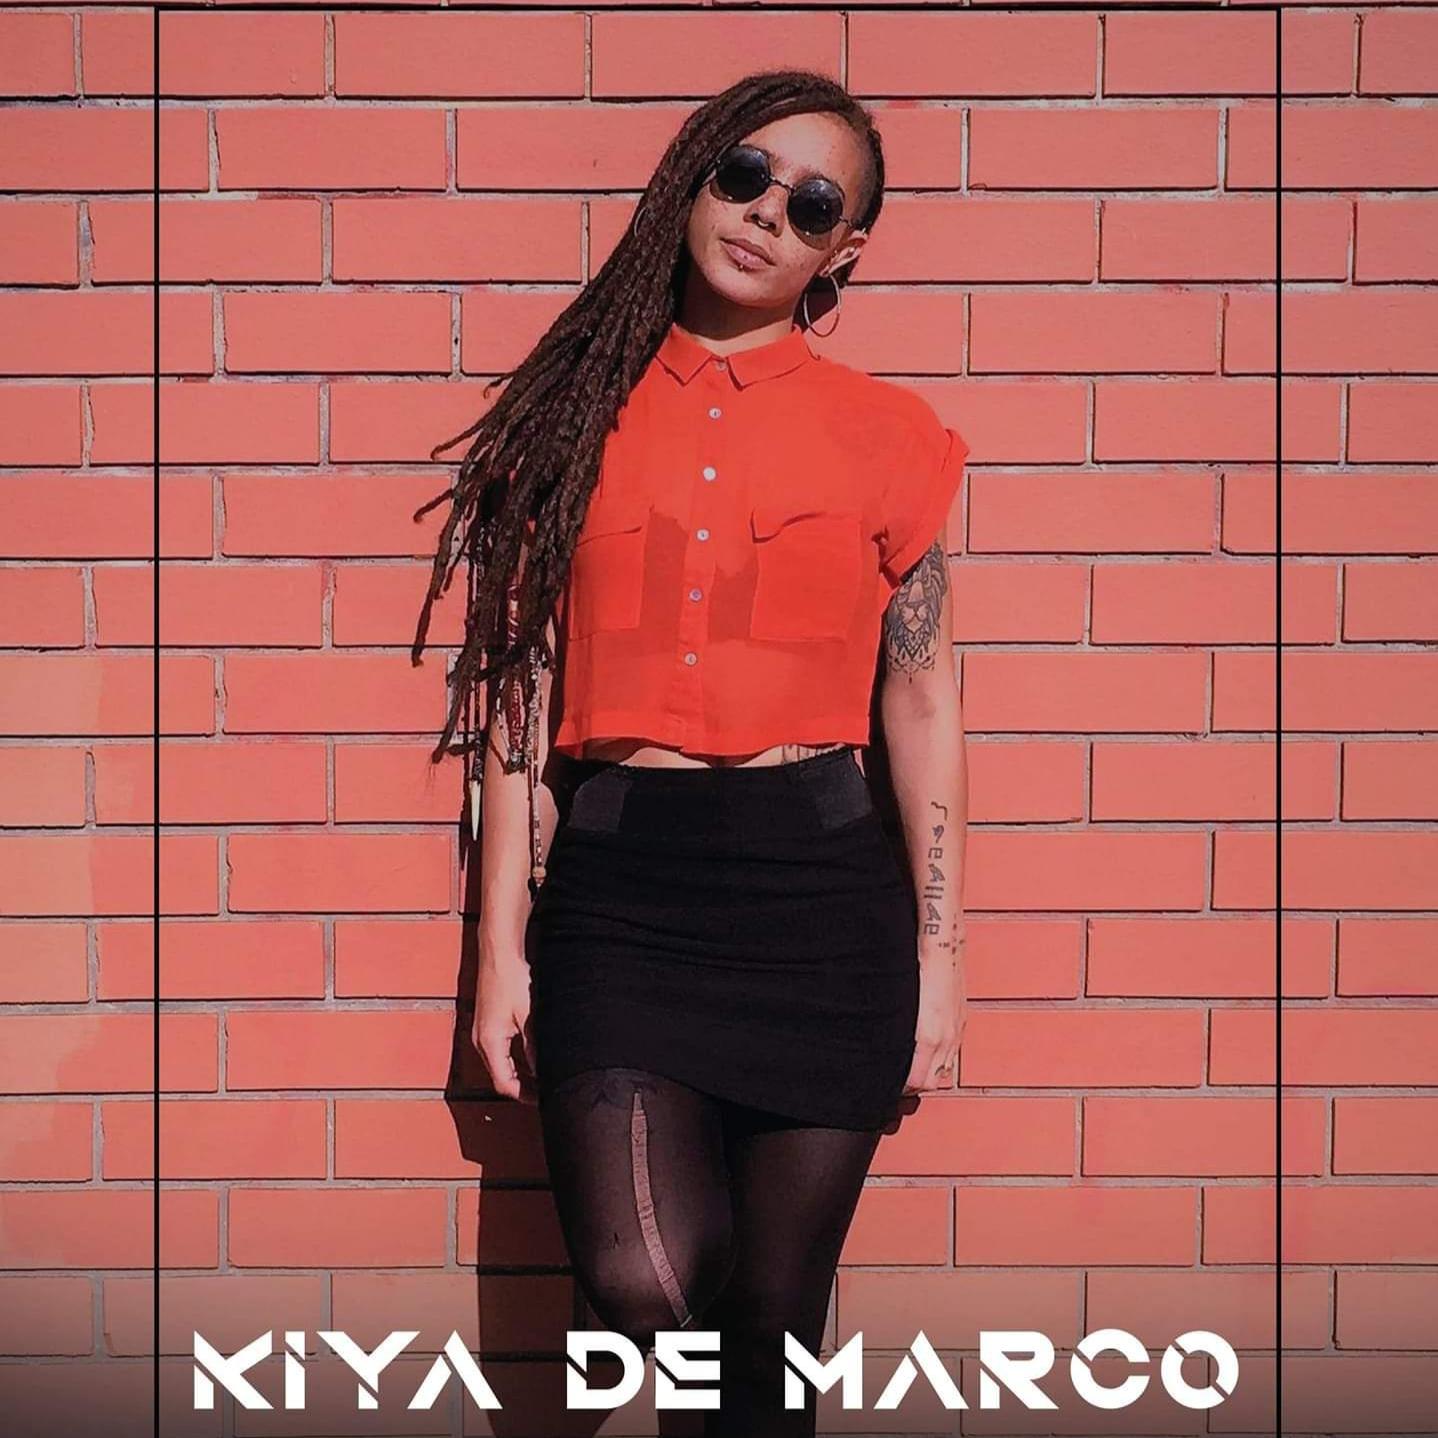 Kiya De Marco